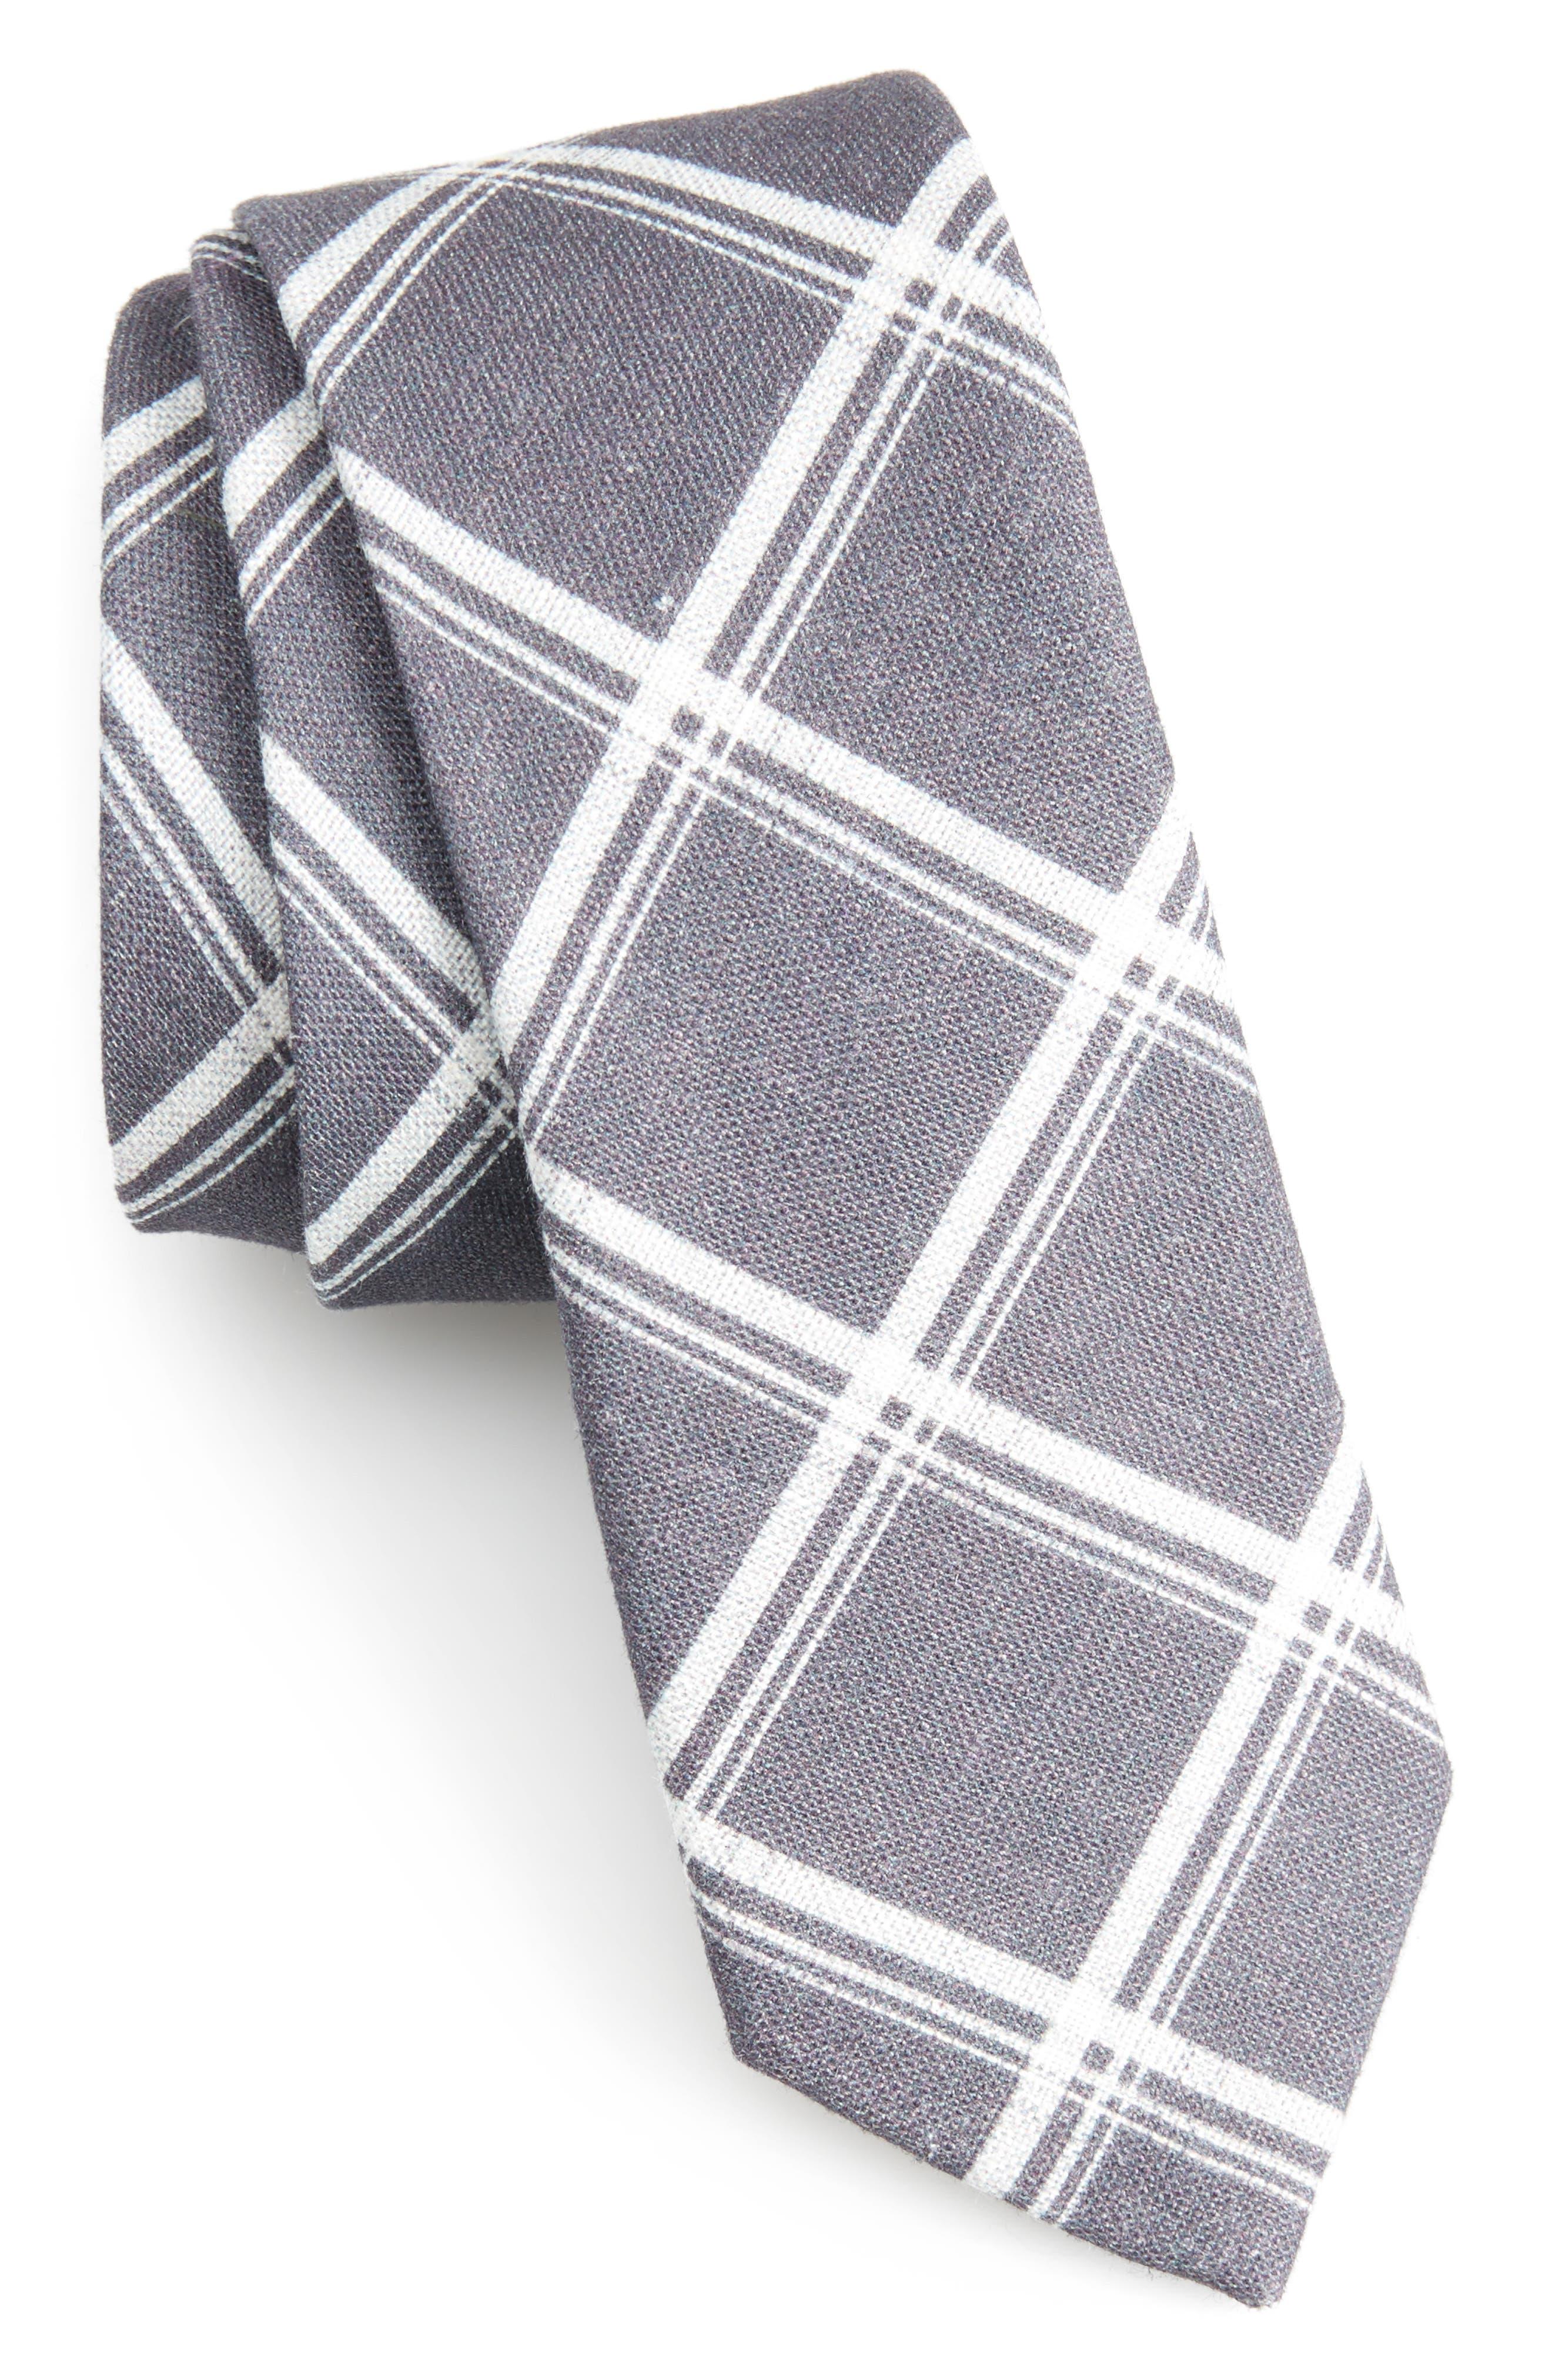 Jet Plaid Linen Skinny Tie,                             Main thumbnail 1, color,